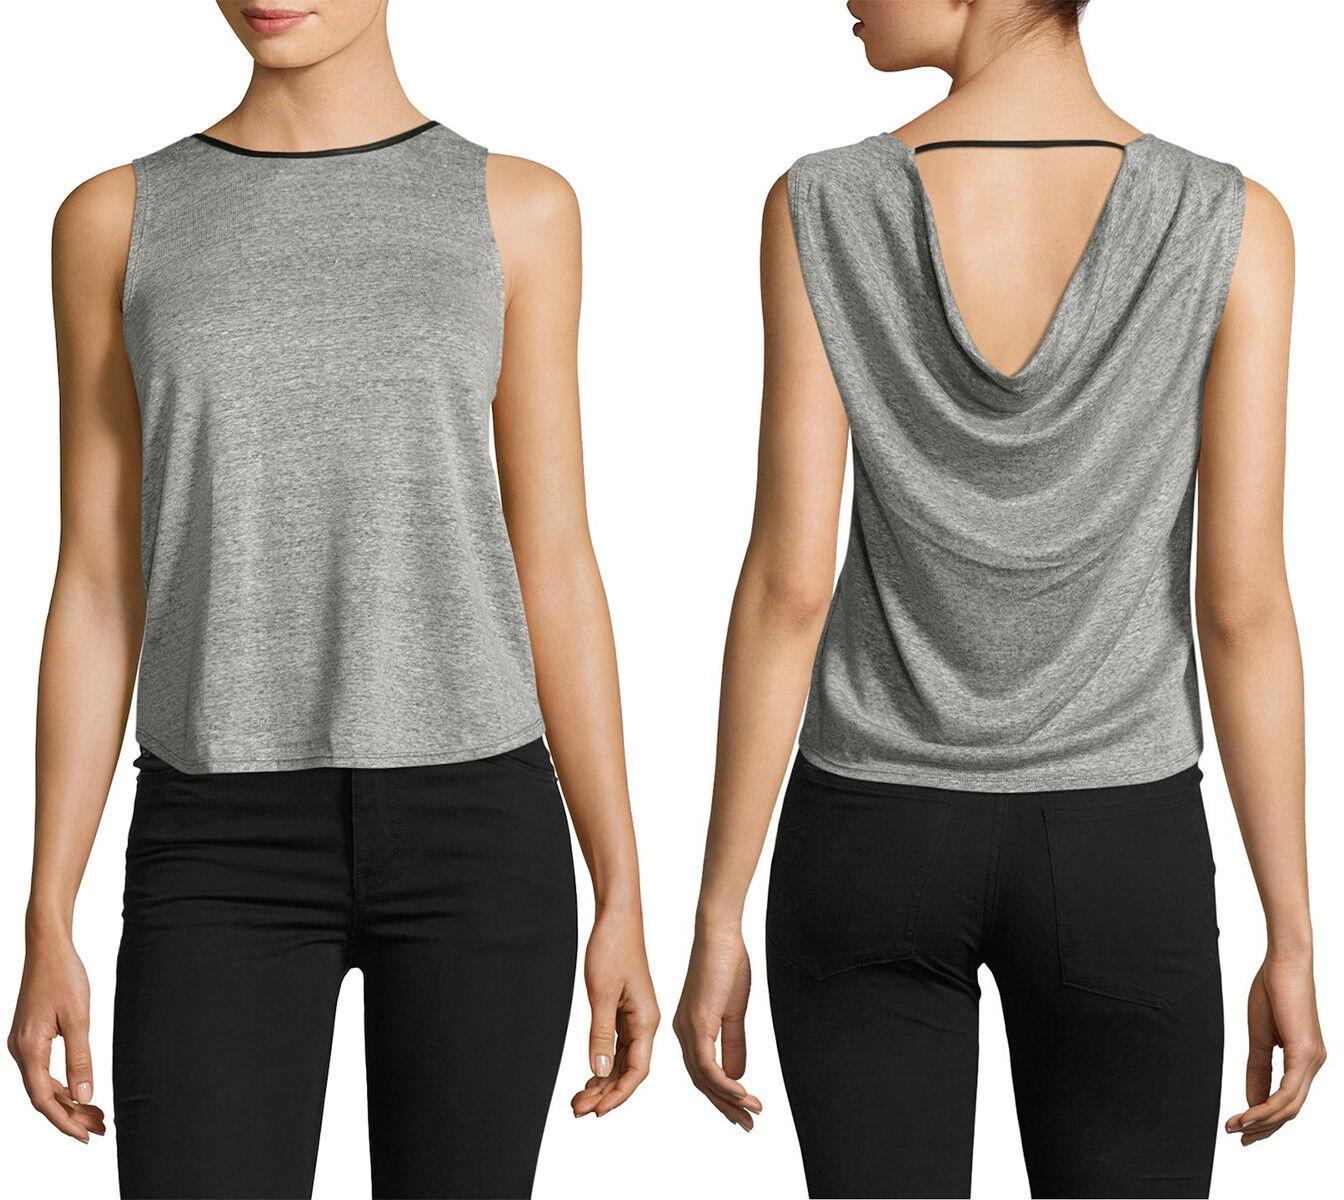 Alice + Olivia Kassie Linen Blend Leather Trim Crop Top Charcoal Größe M